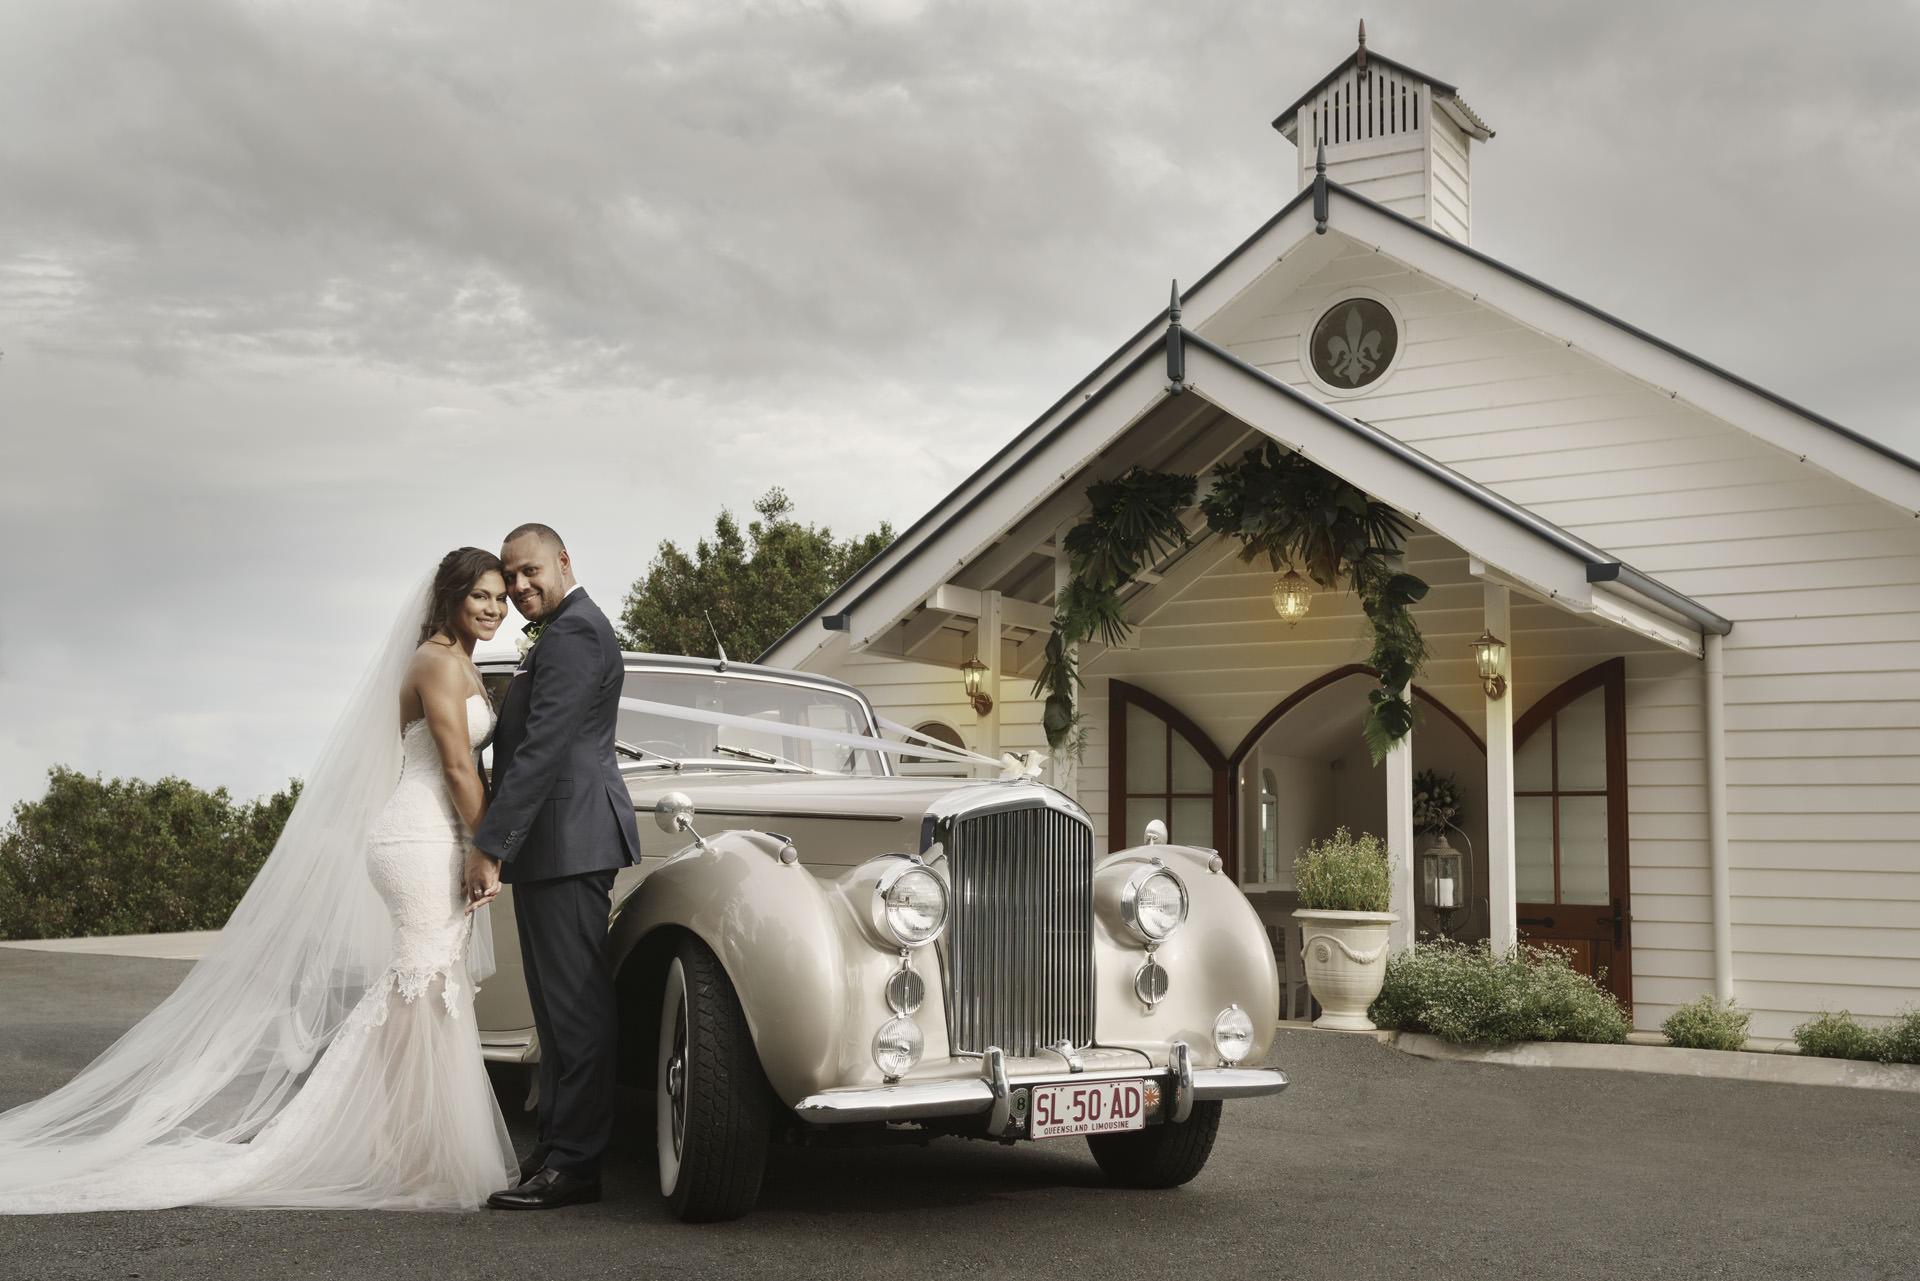 Weddings at Tiffany's Wedding Venue